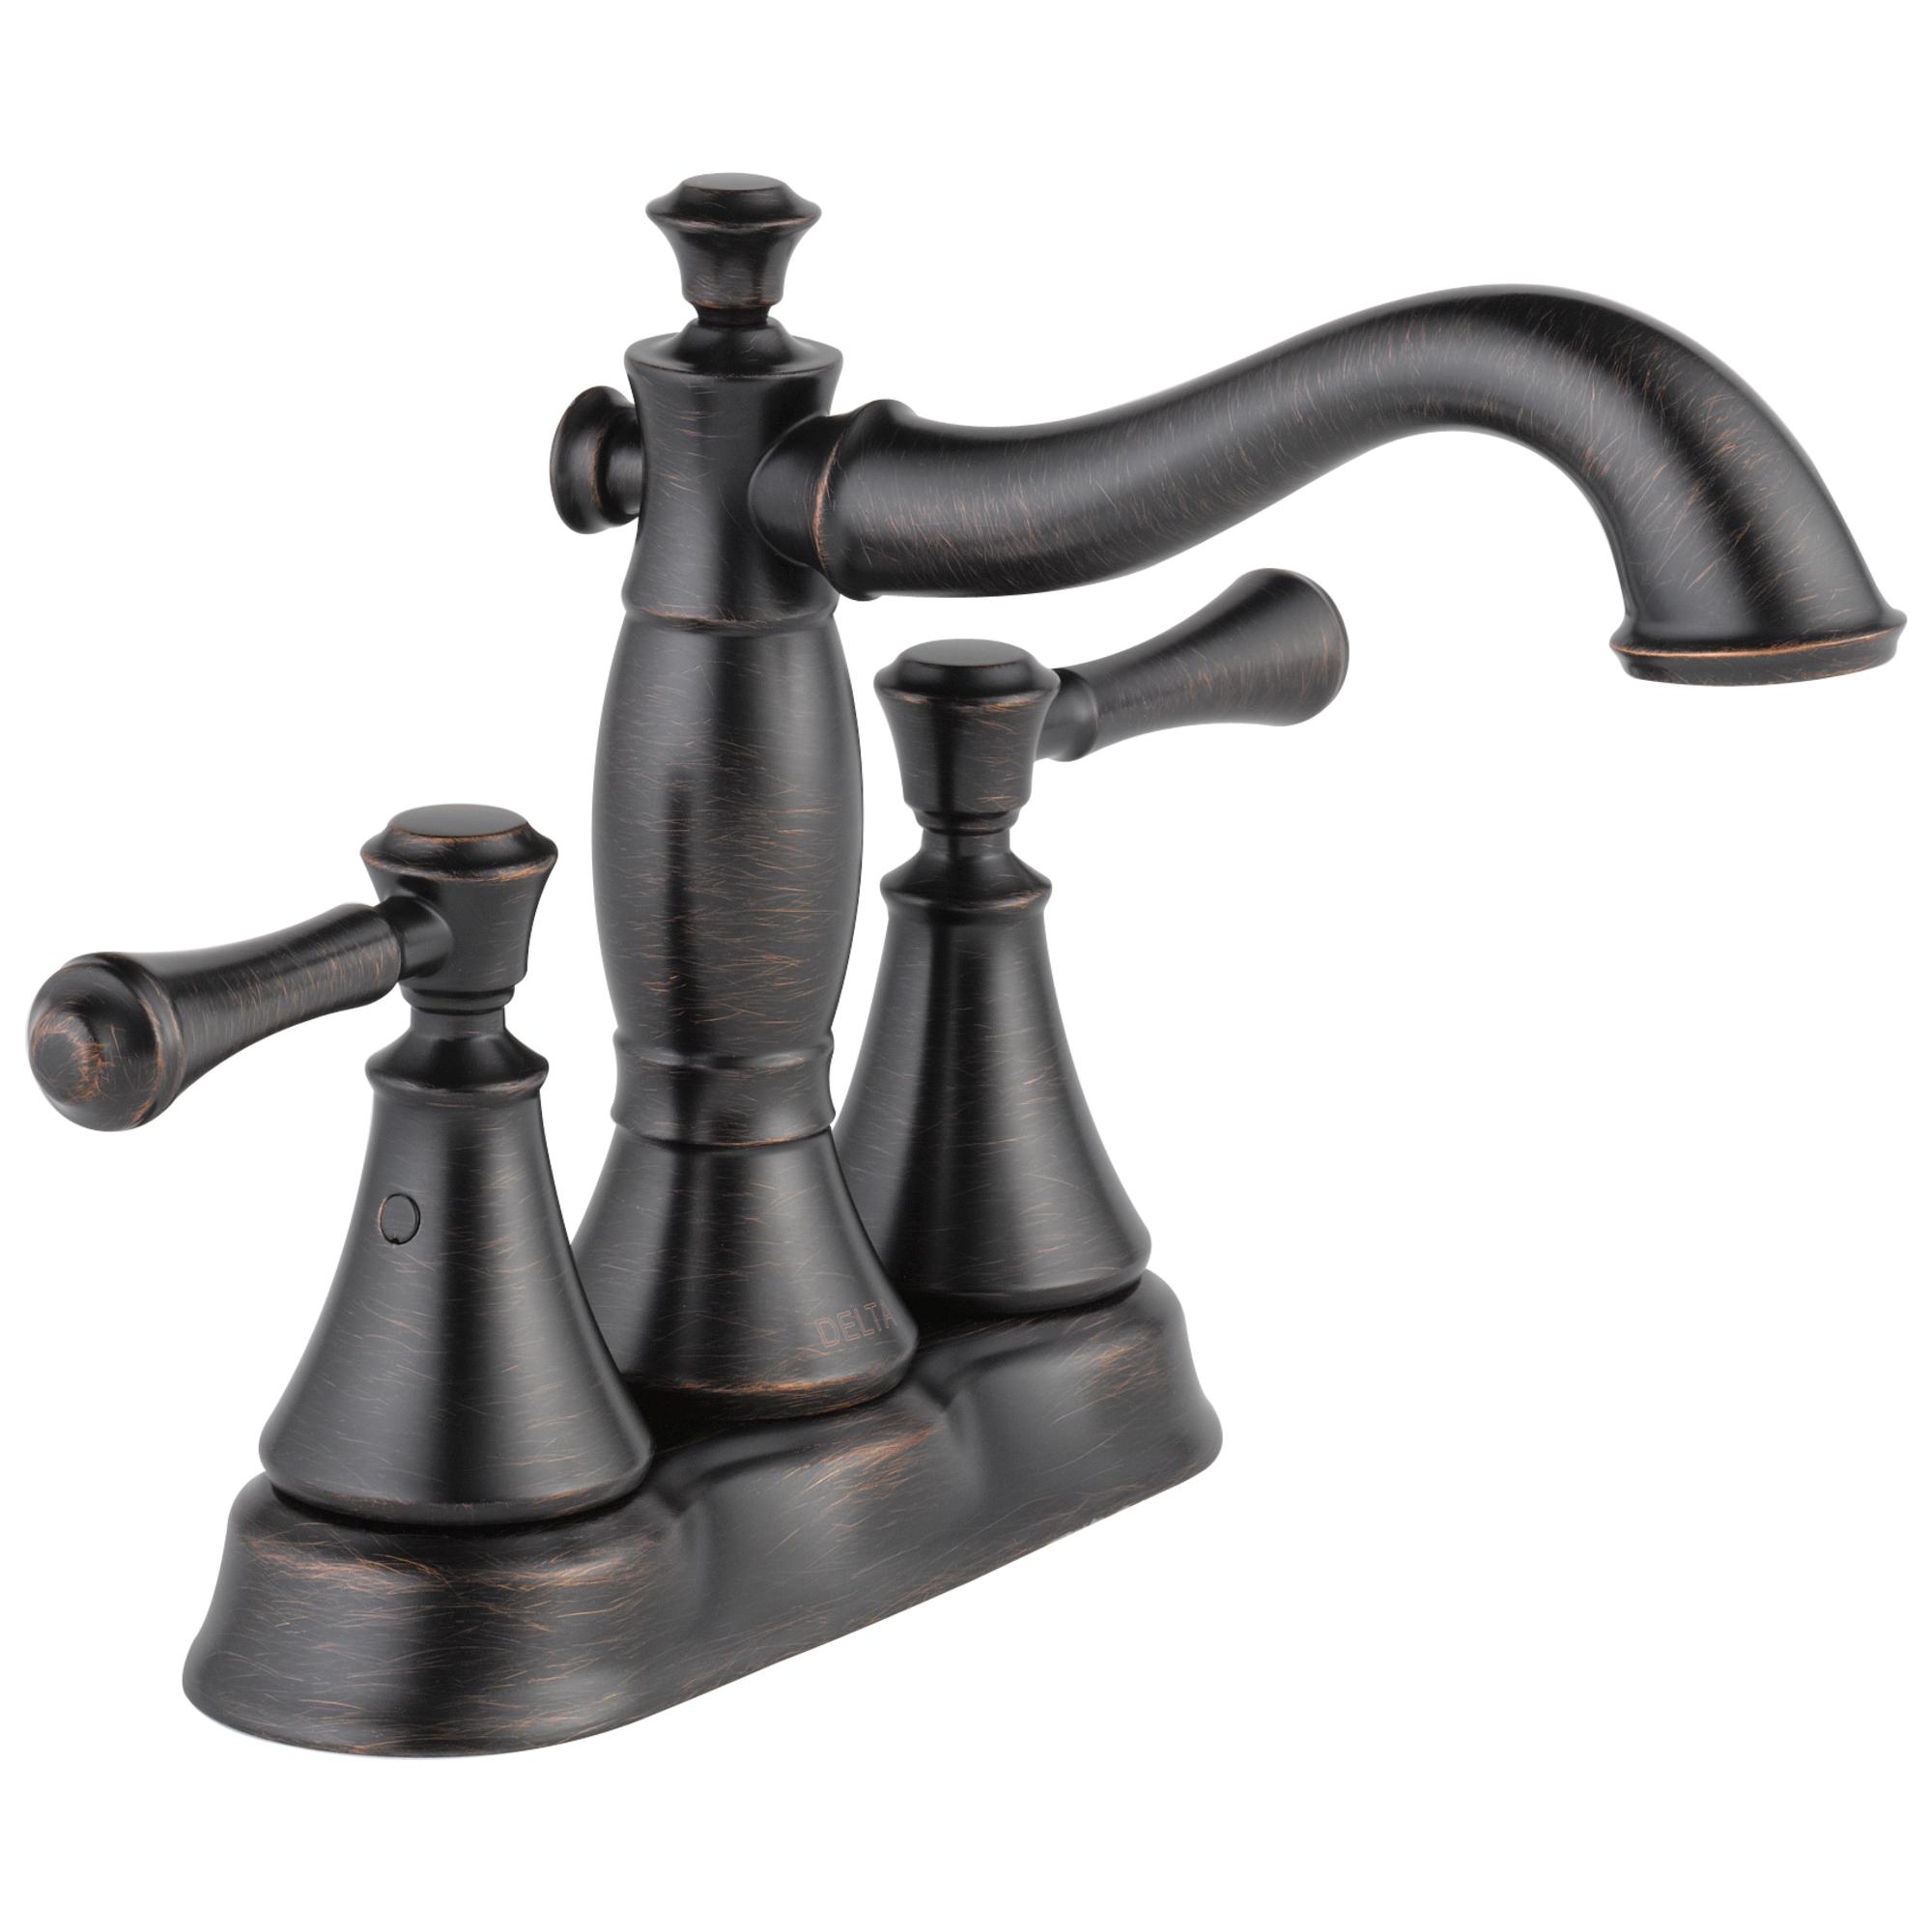 DELTA® 2597LF-RBMPU Centerset Bathroom Faucet, Cassidy™, Venetian Bronze, 2 Handles, Metal Pop-Up Drain, 1.2 gpm